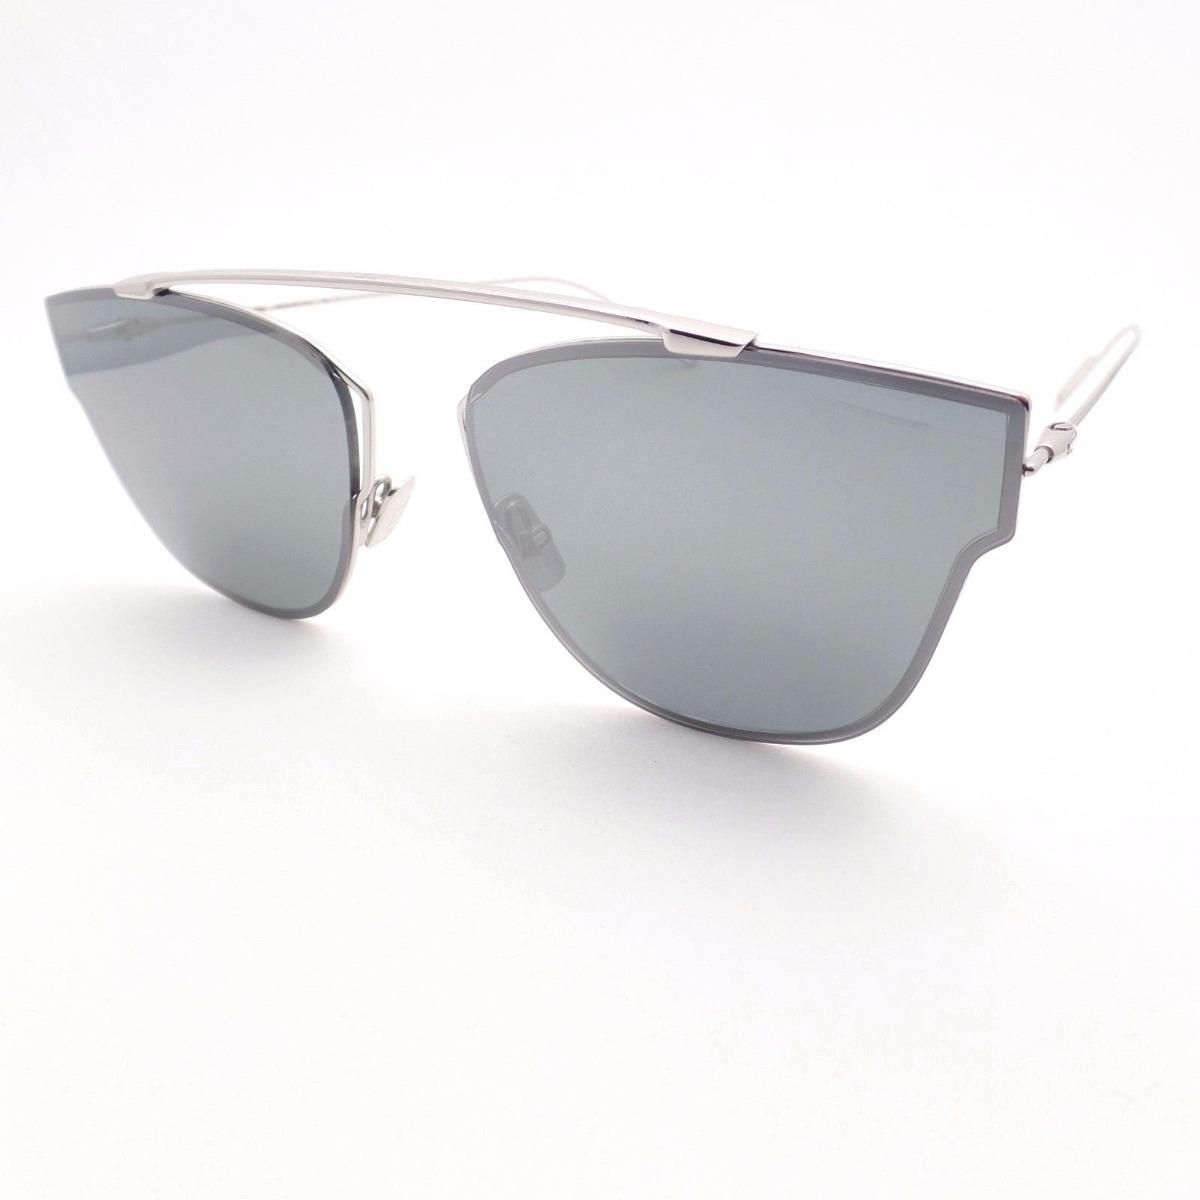 Lentes De Sol Christian Dior Homme 204s Silver -   2,499.00 en ... b8031667007a